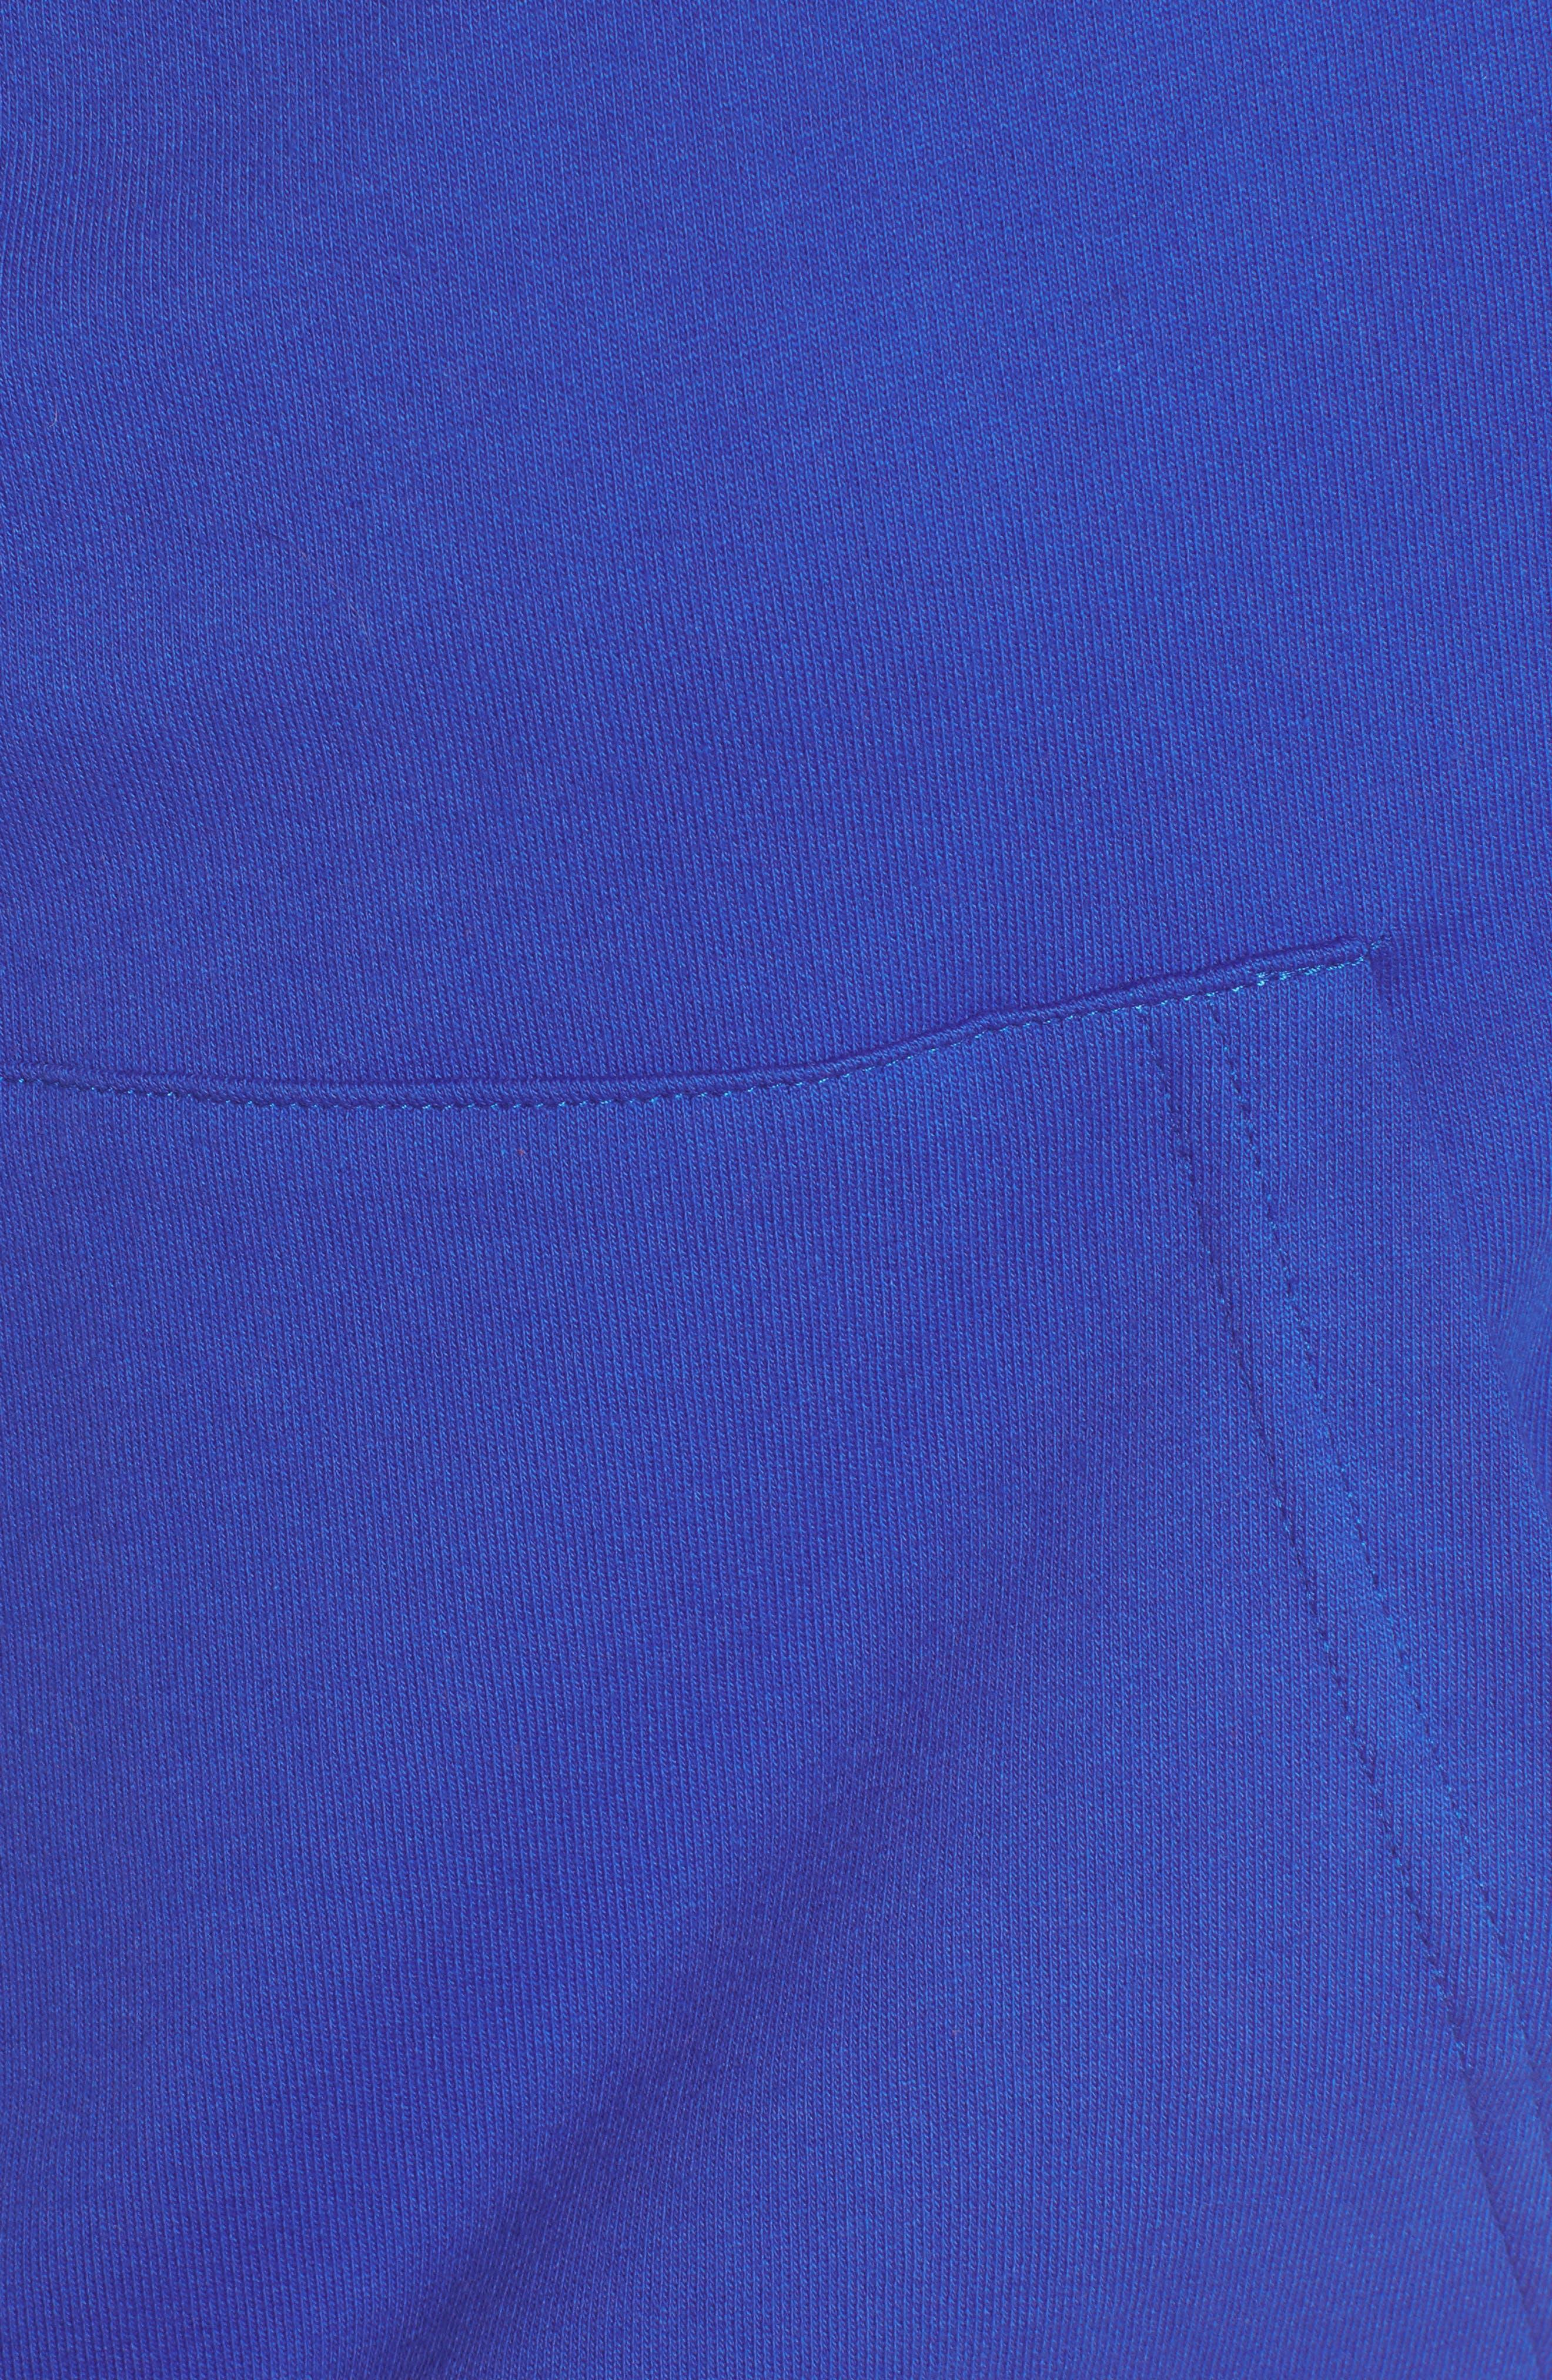 ME. Rose Sweatpants,                             Alternate thumbnail 7, color,                             400